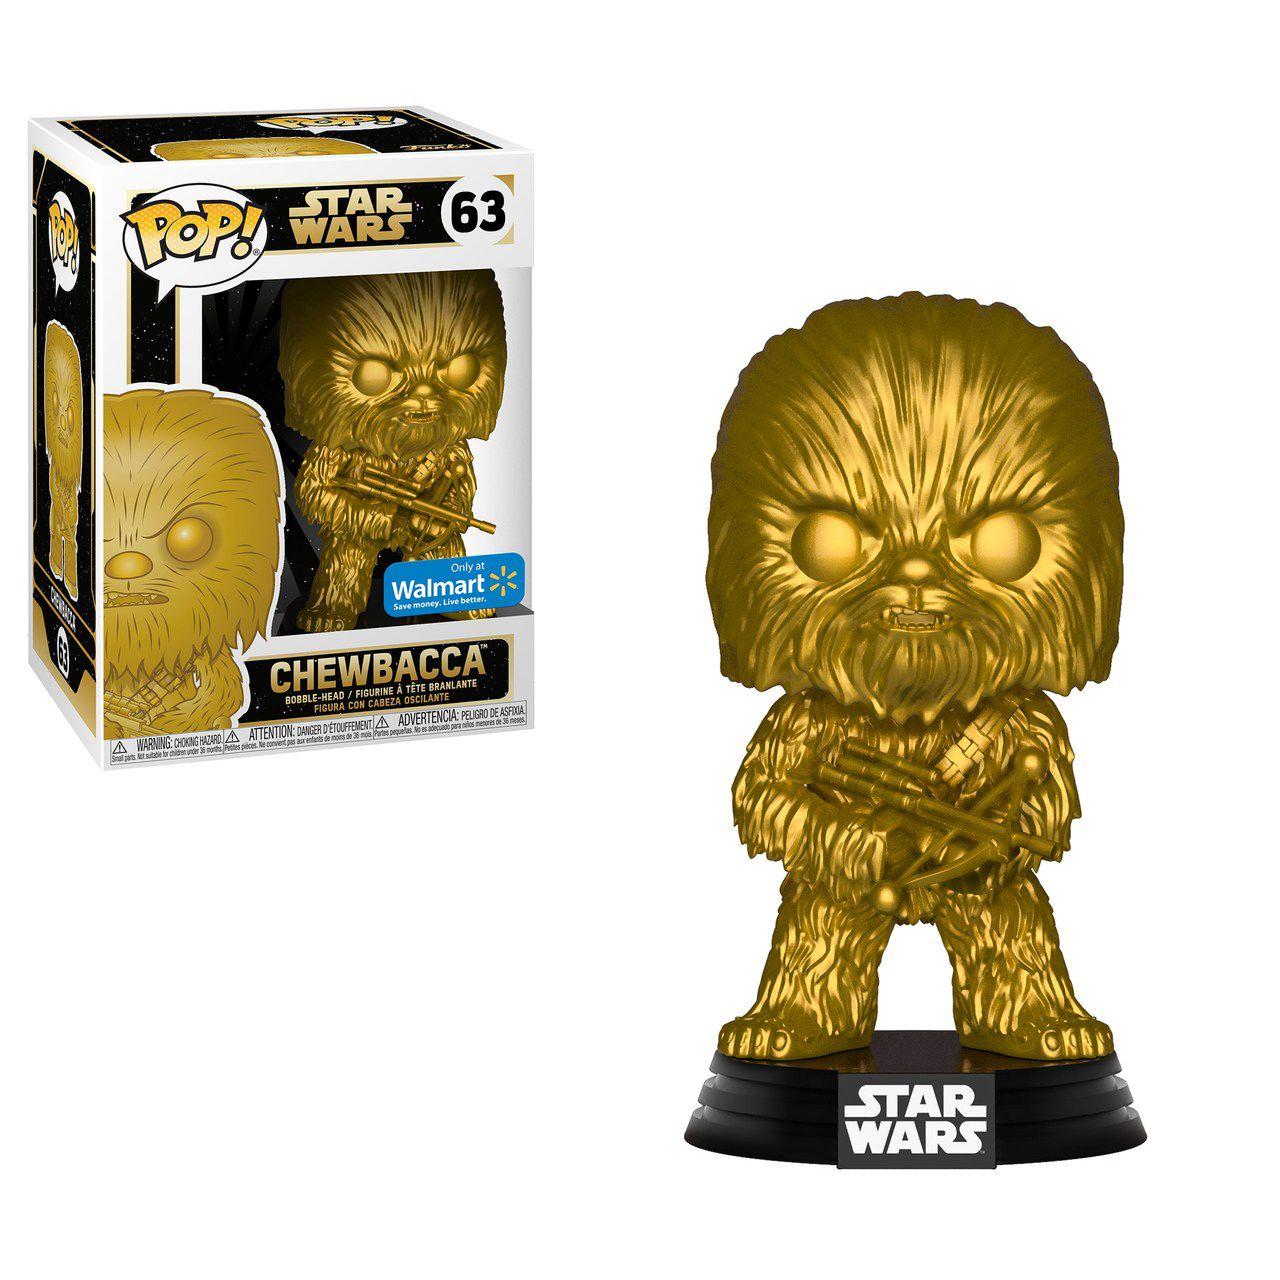 Pop! Chewbacca: Star Wars (Gold Metallic) Exclusivo #63 - Funko (Apenas Venda Online)